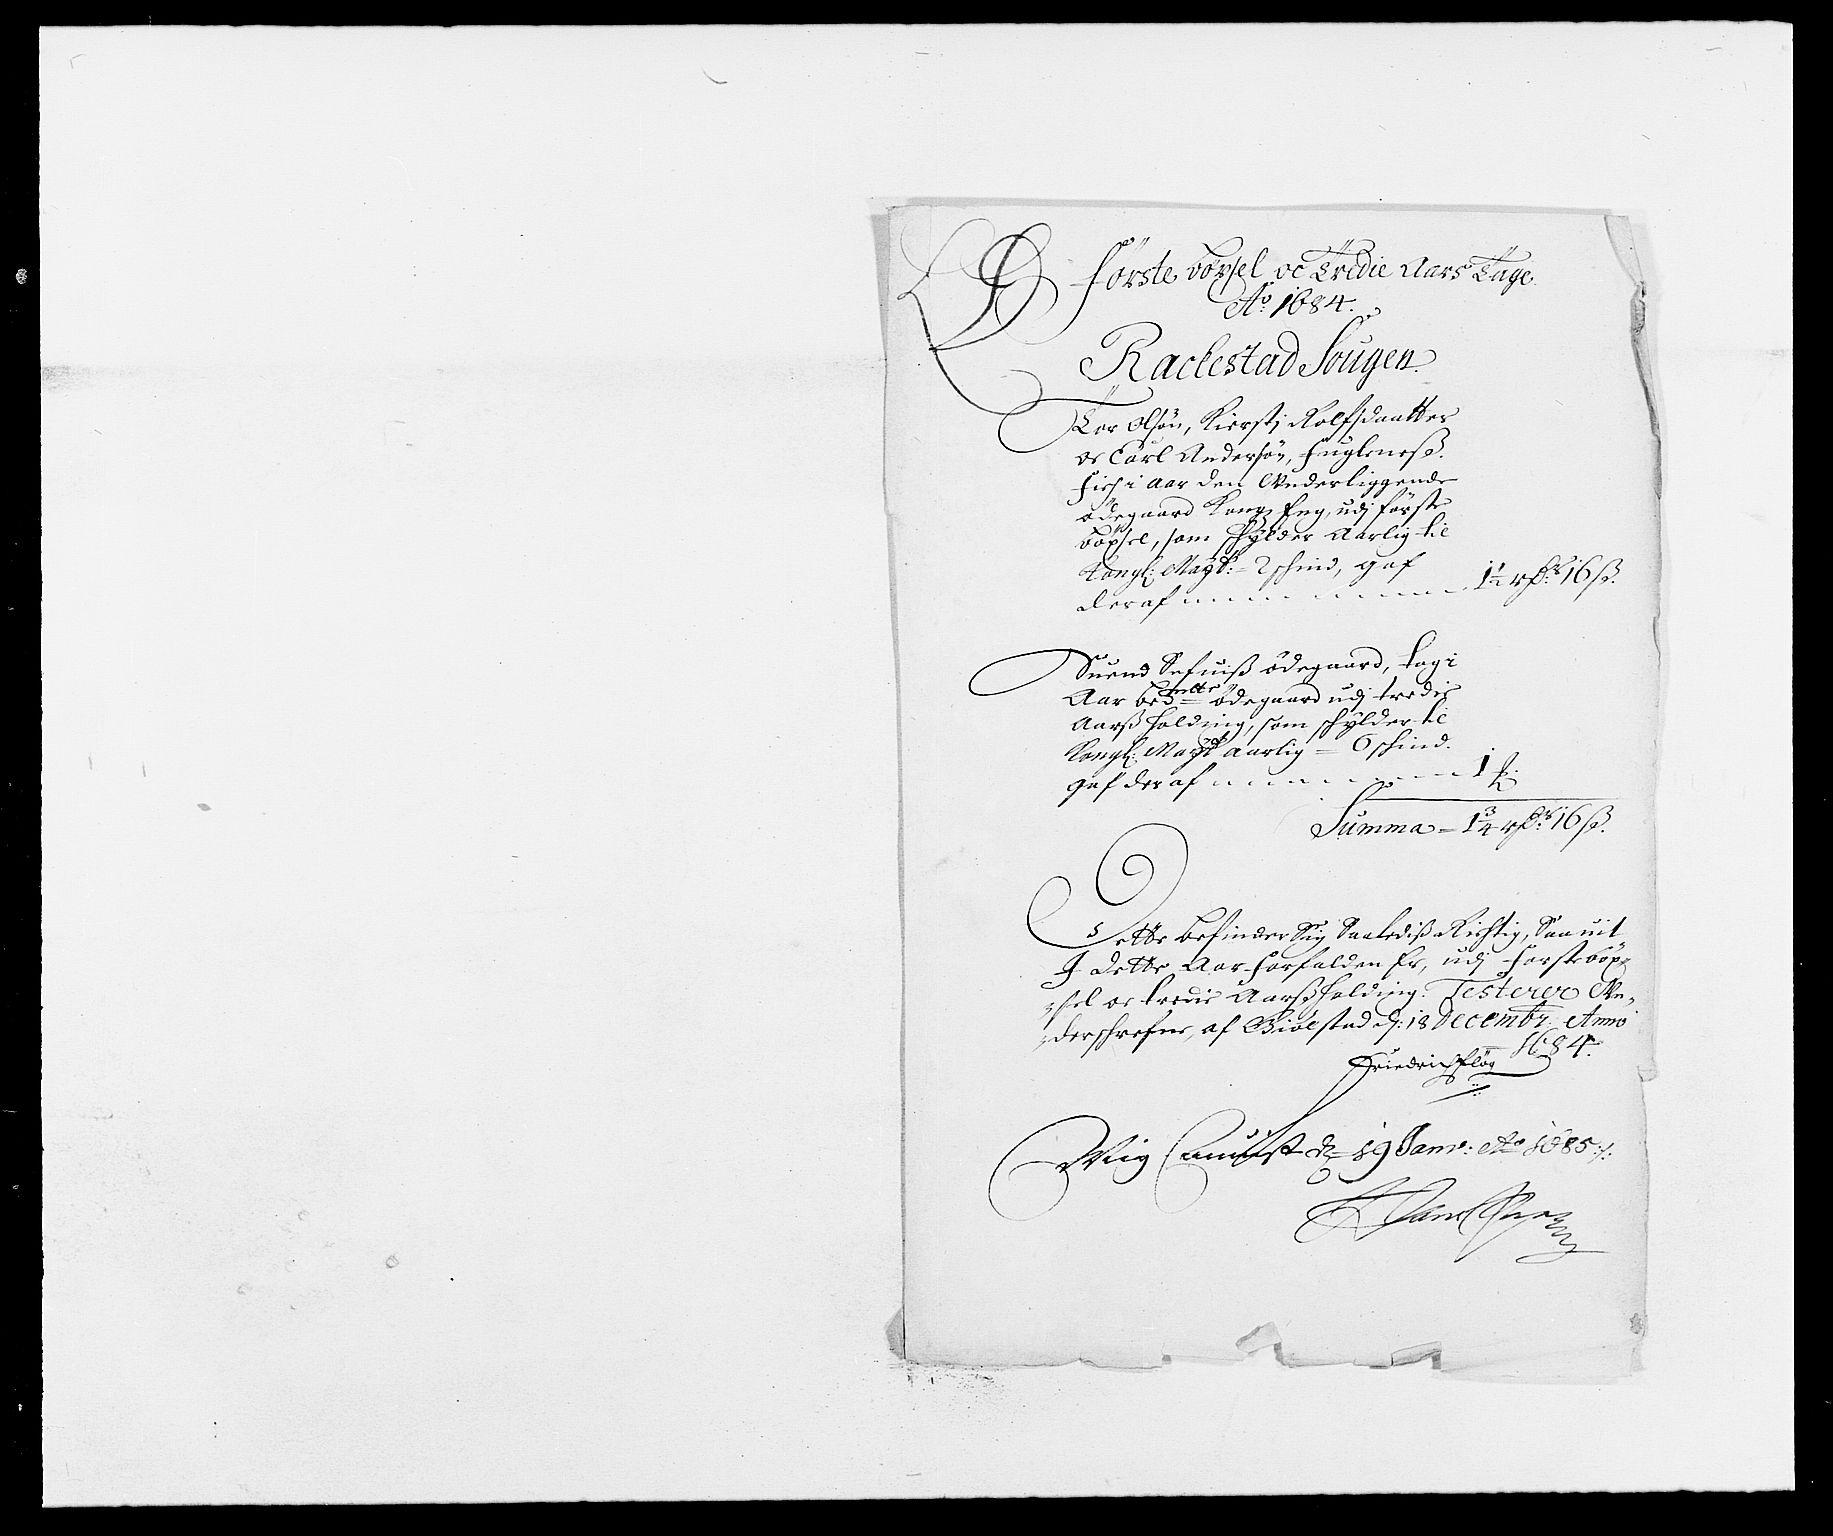 RA, Rentekammeret inntil 1814, Reviderte regnskaper, Fogderegnskap, R05/L0274: Fogderegnskap Rakkestad, 1683-1684, s. 336